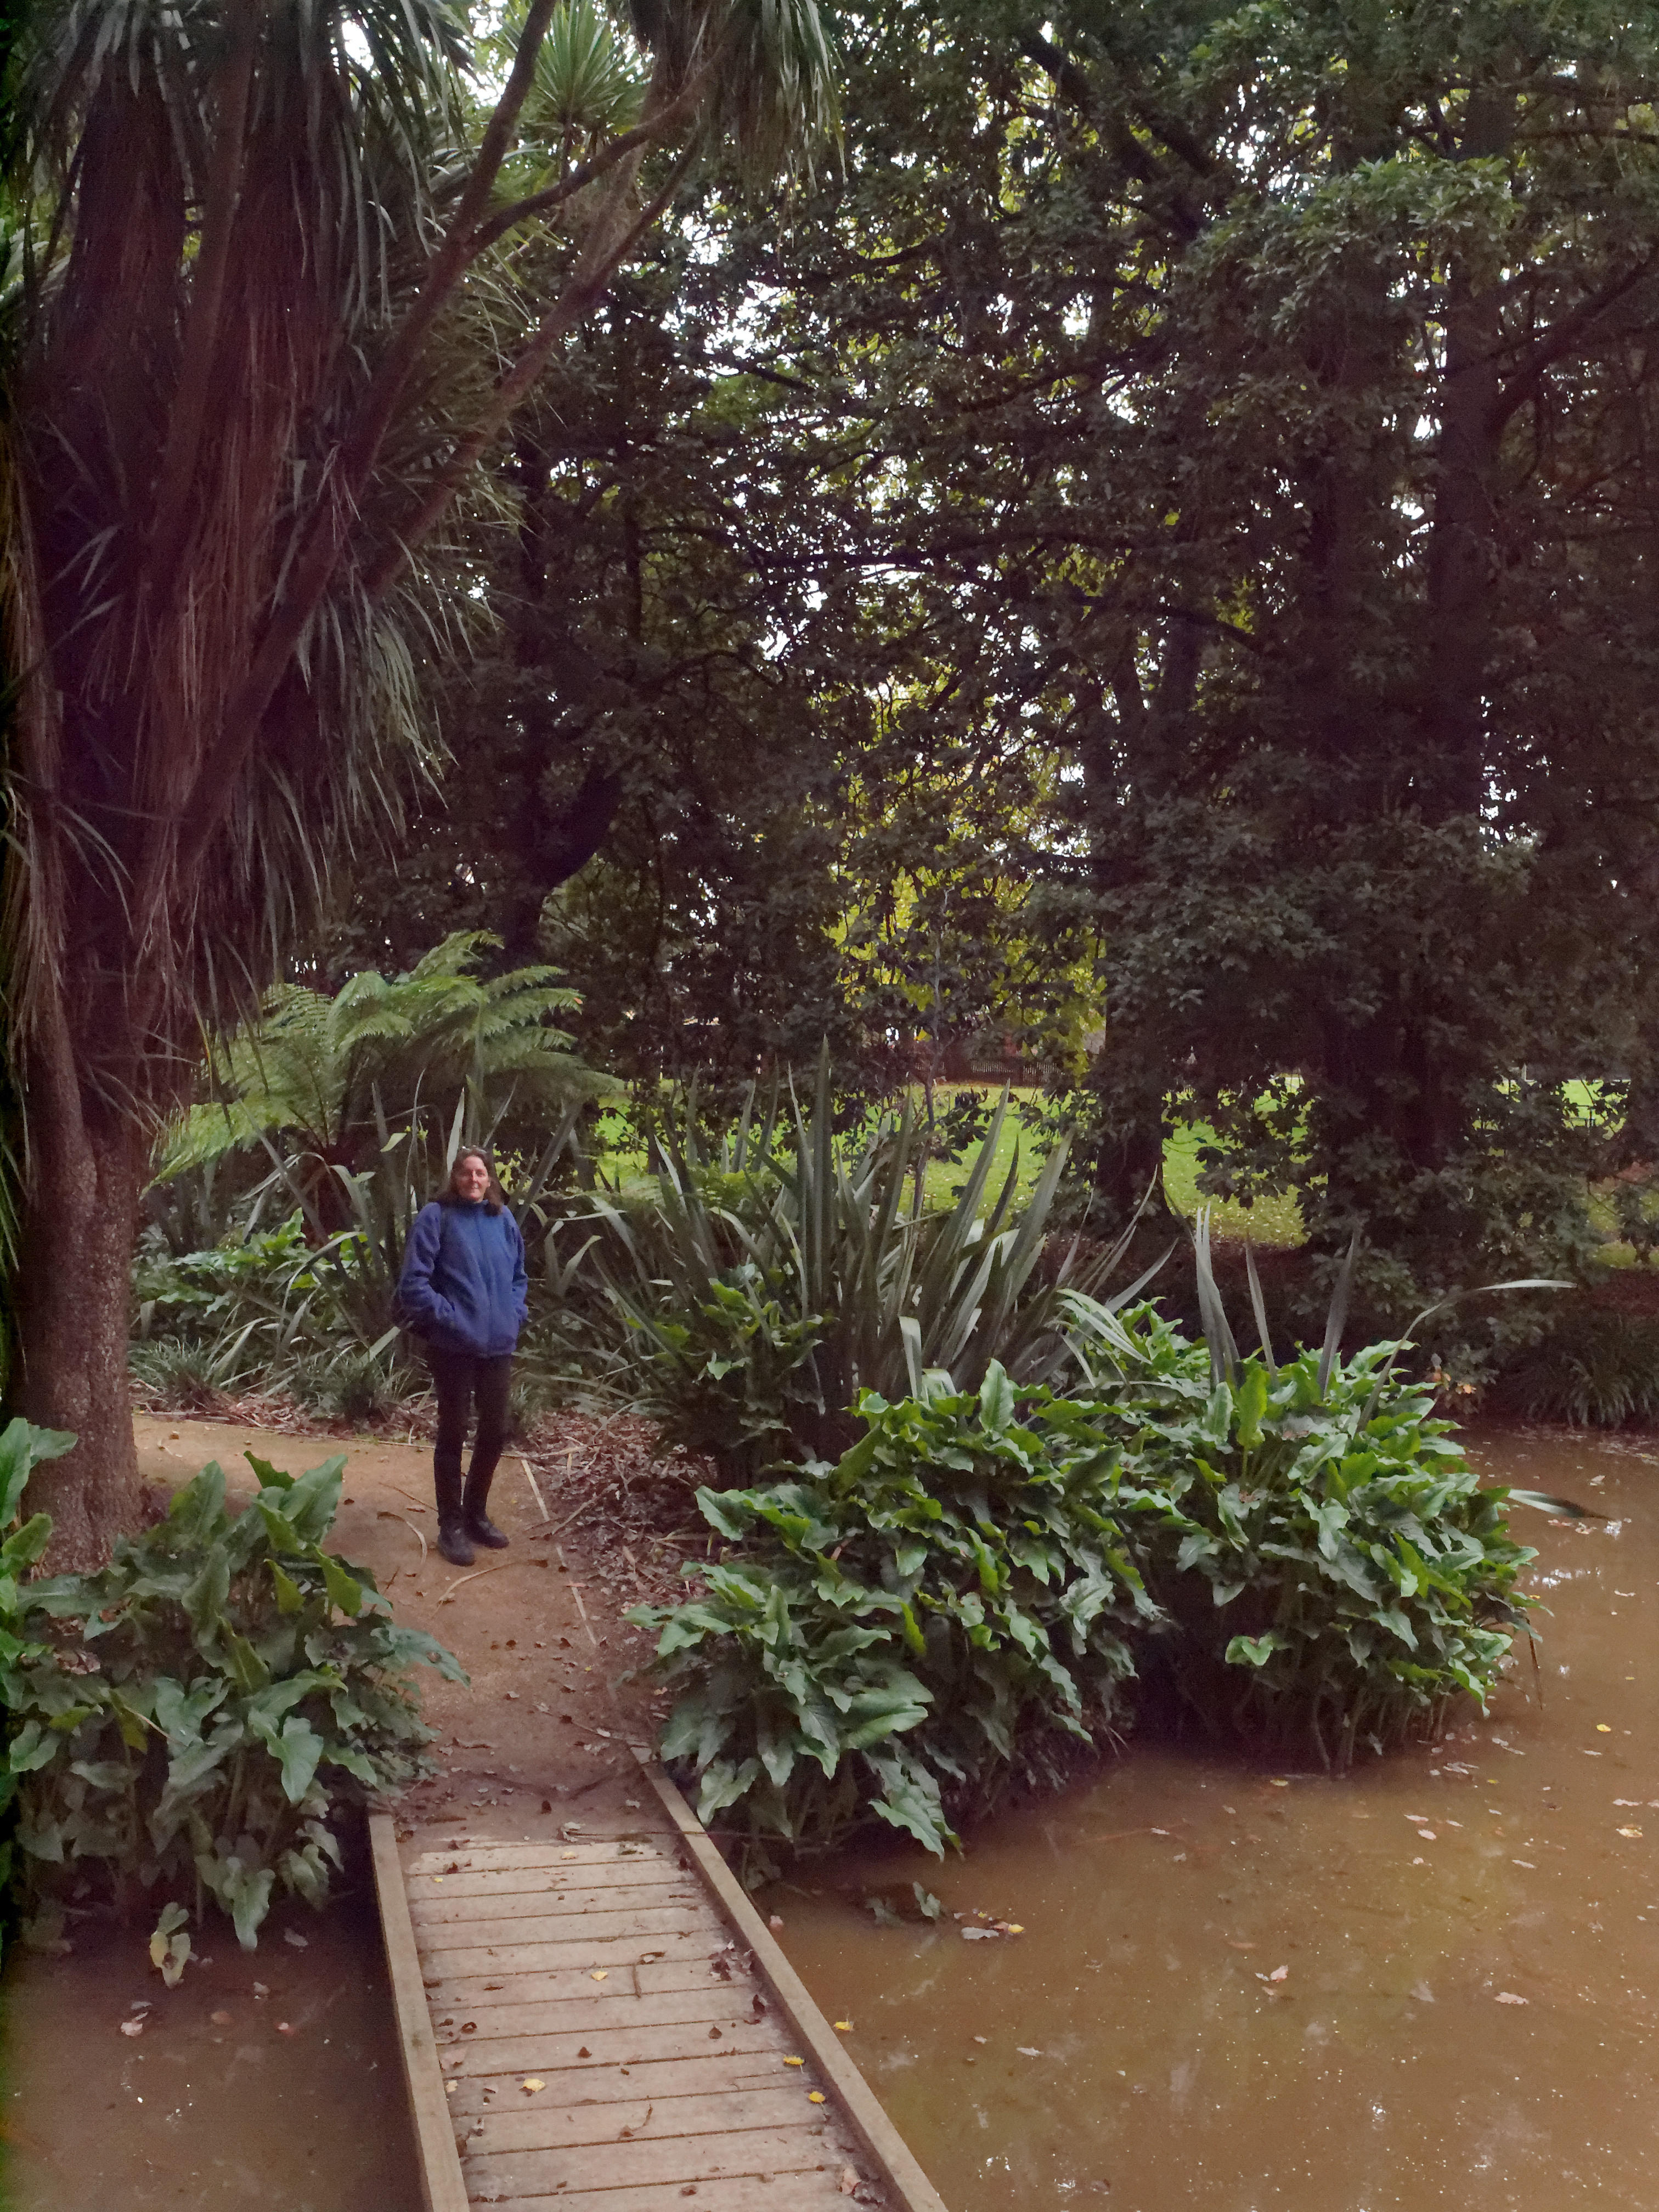 Buninyong-Botanic-Gardens-1-DxO--orig.jpeg